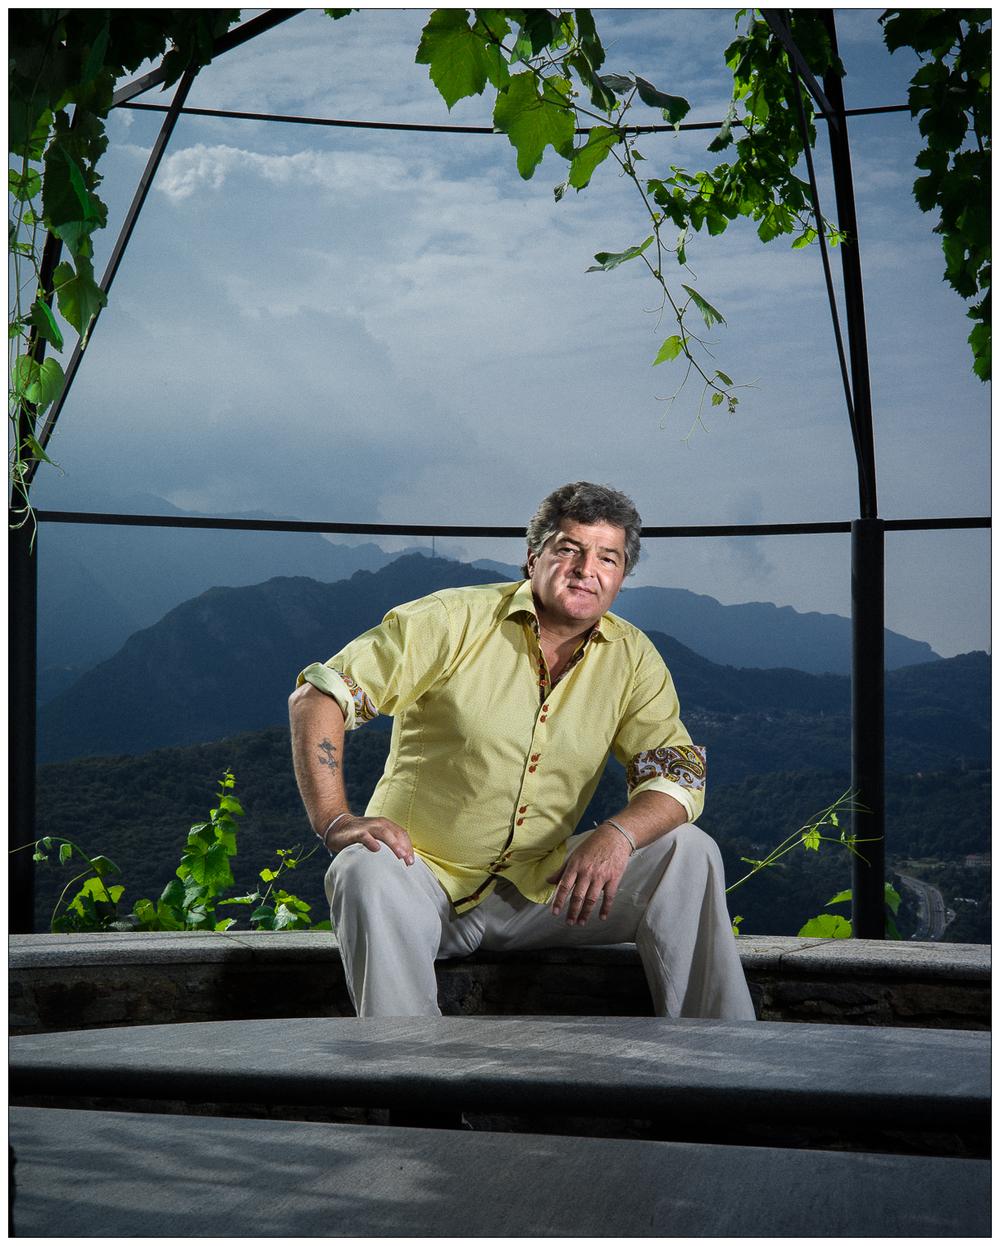 Ivo Monti, vigneron